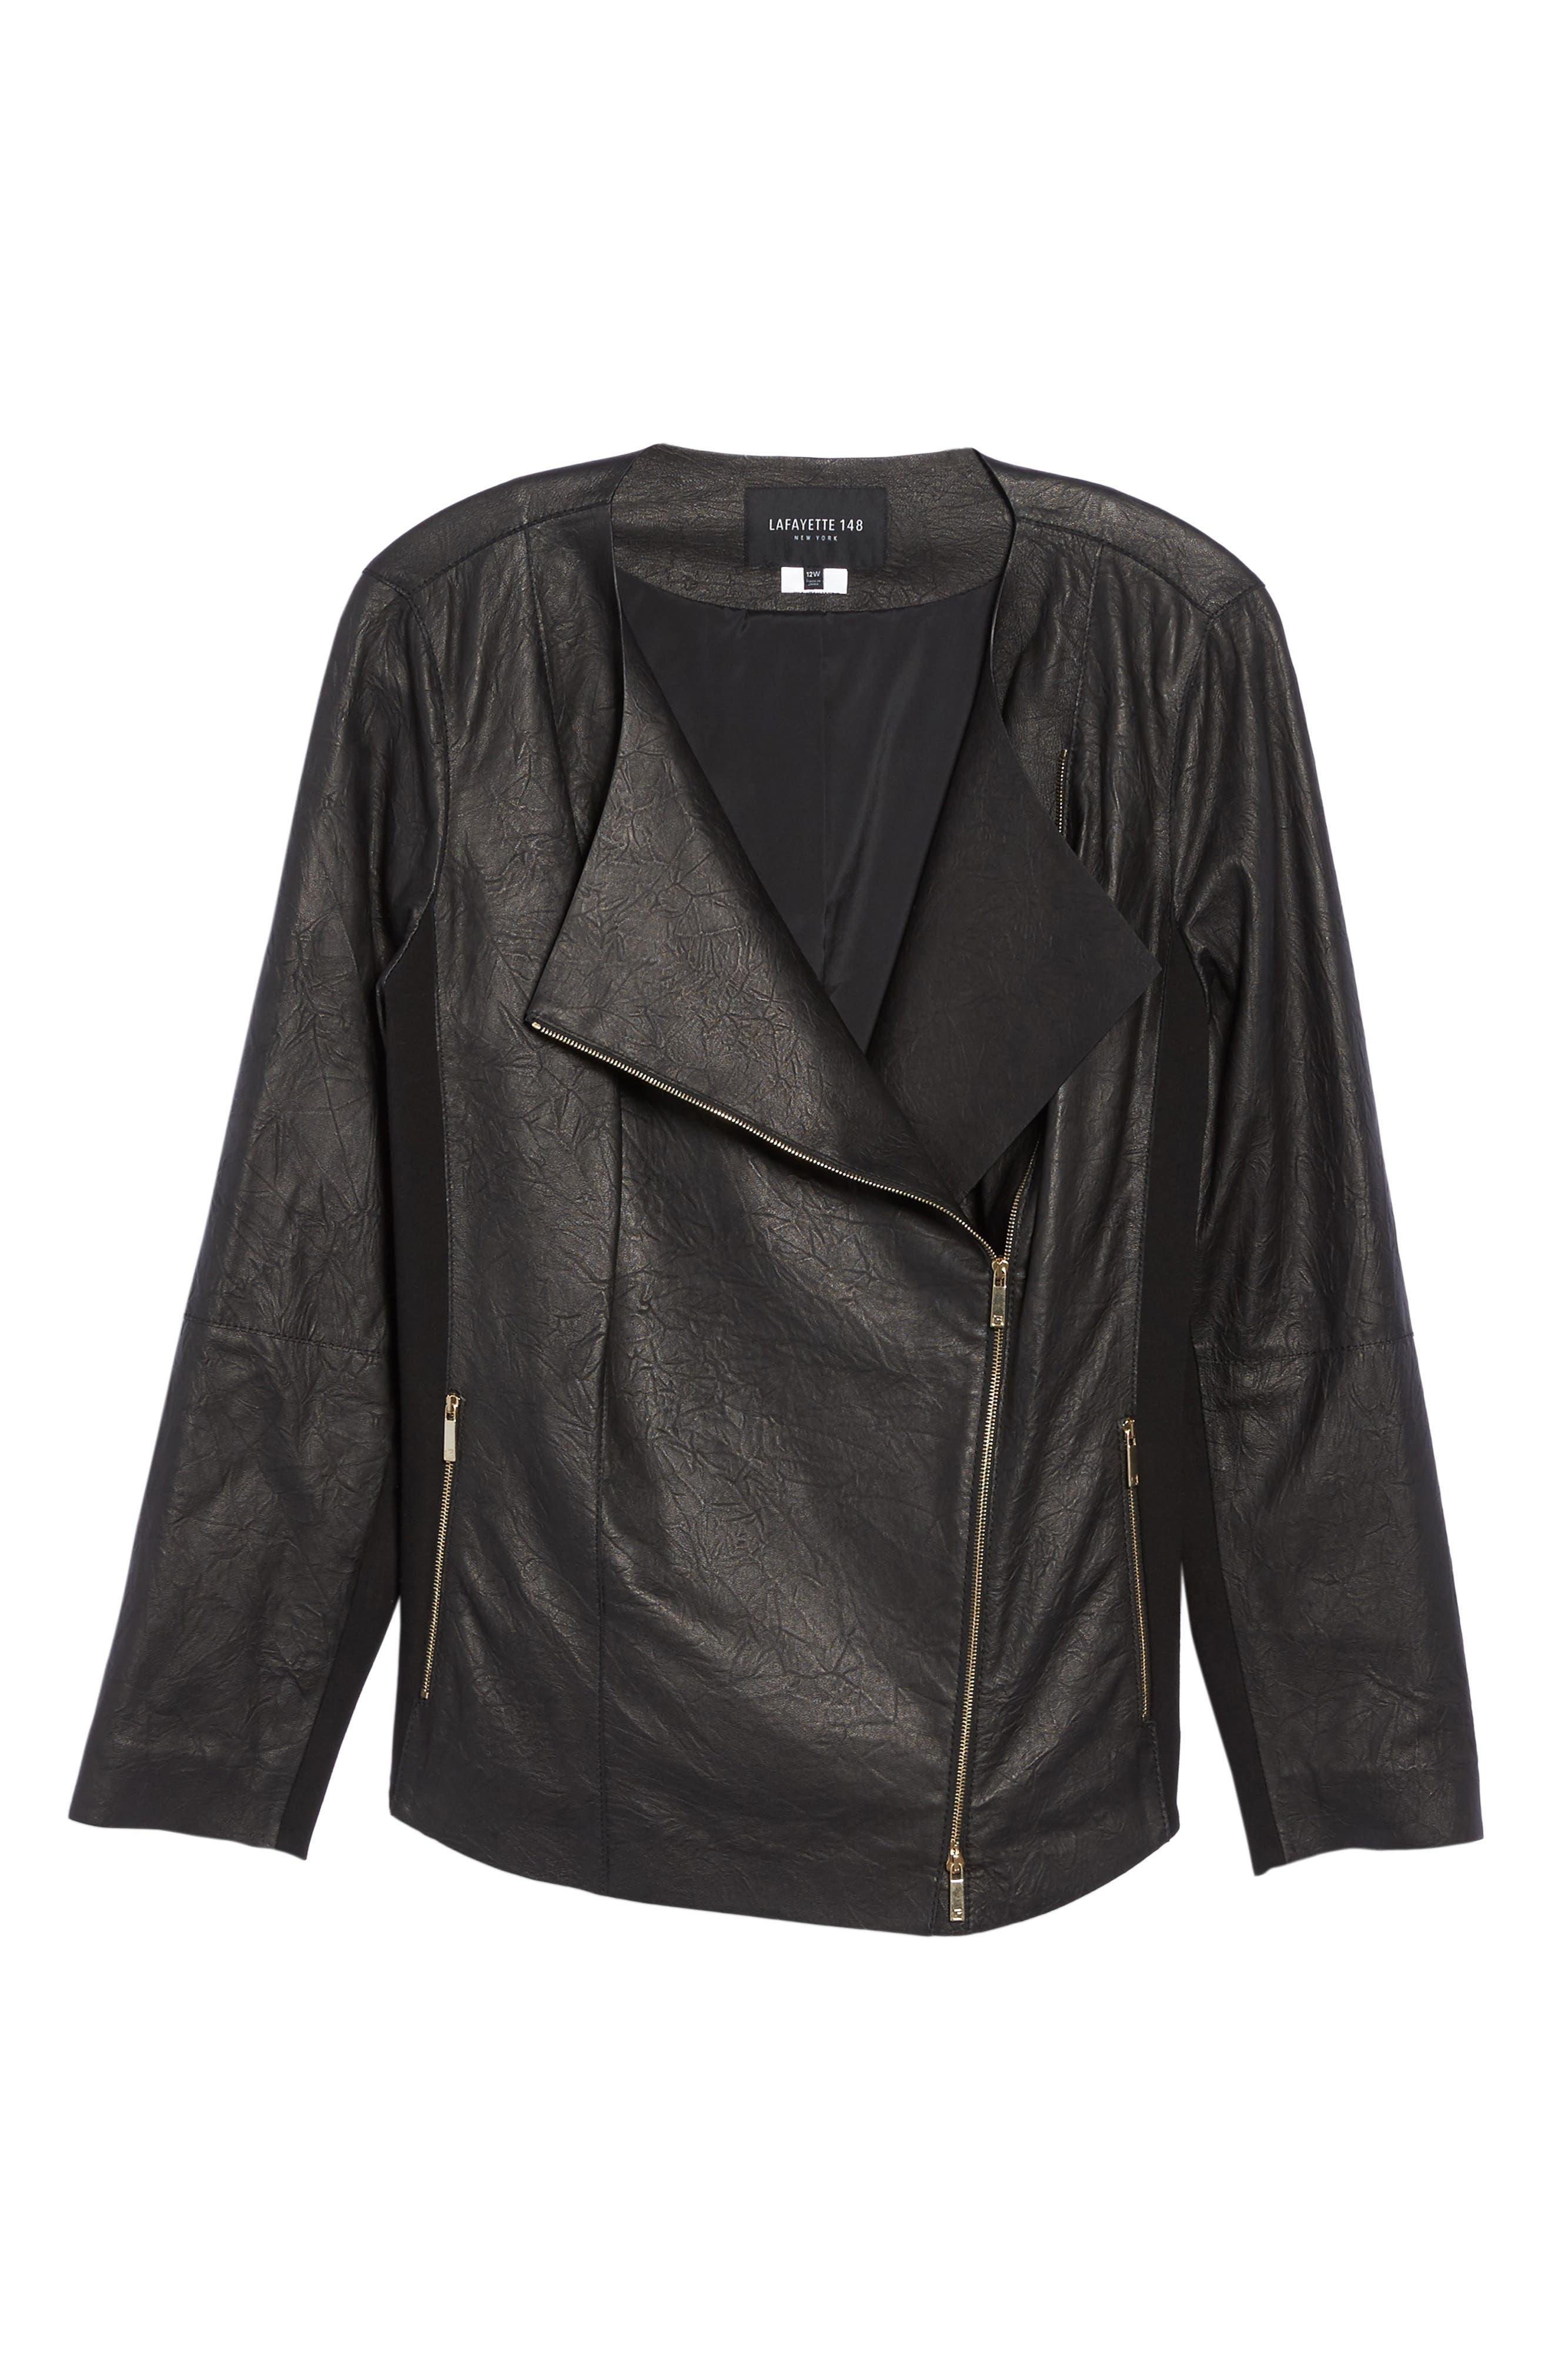 Aimes Leather Jacket,                             Alternate thumbnail 6, color,                             Black